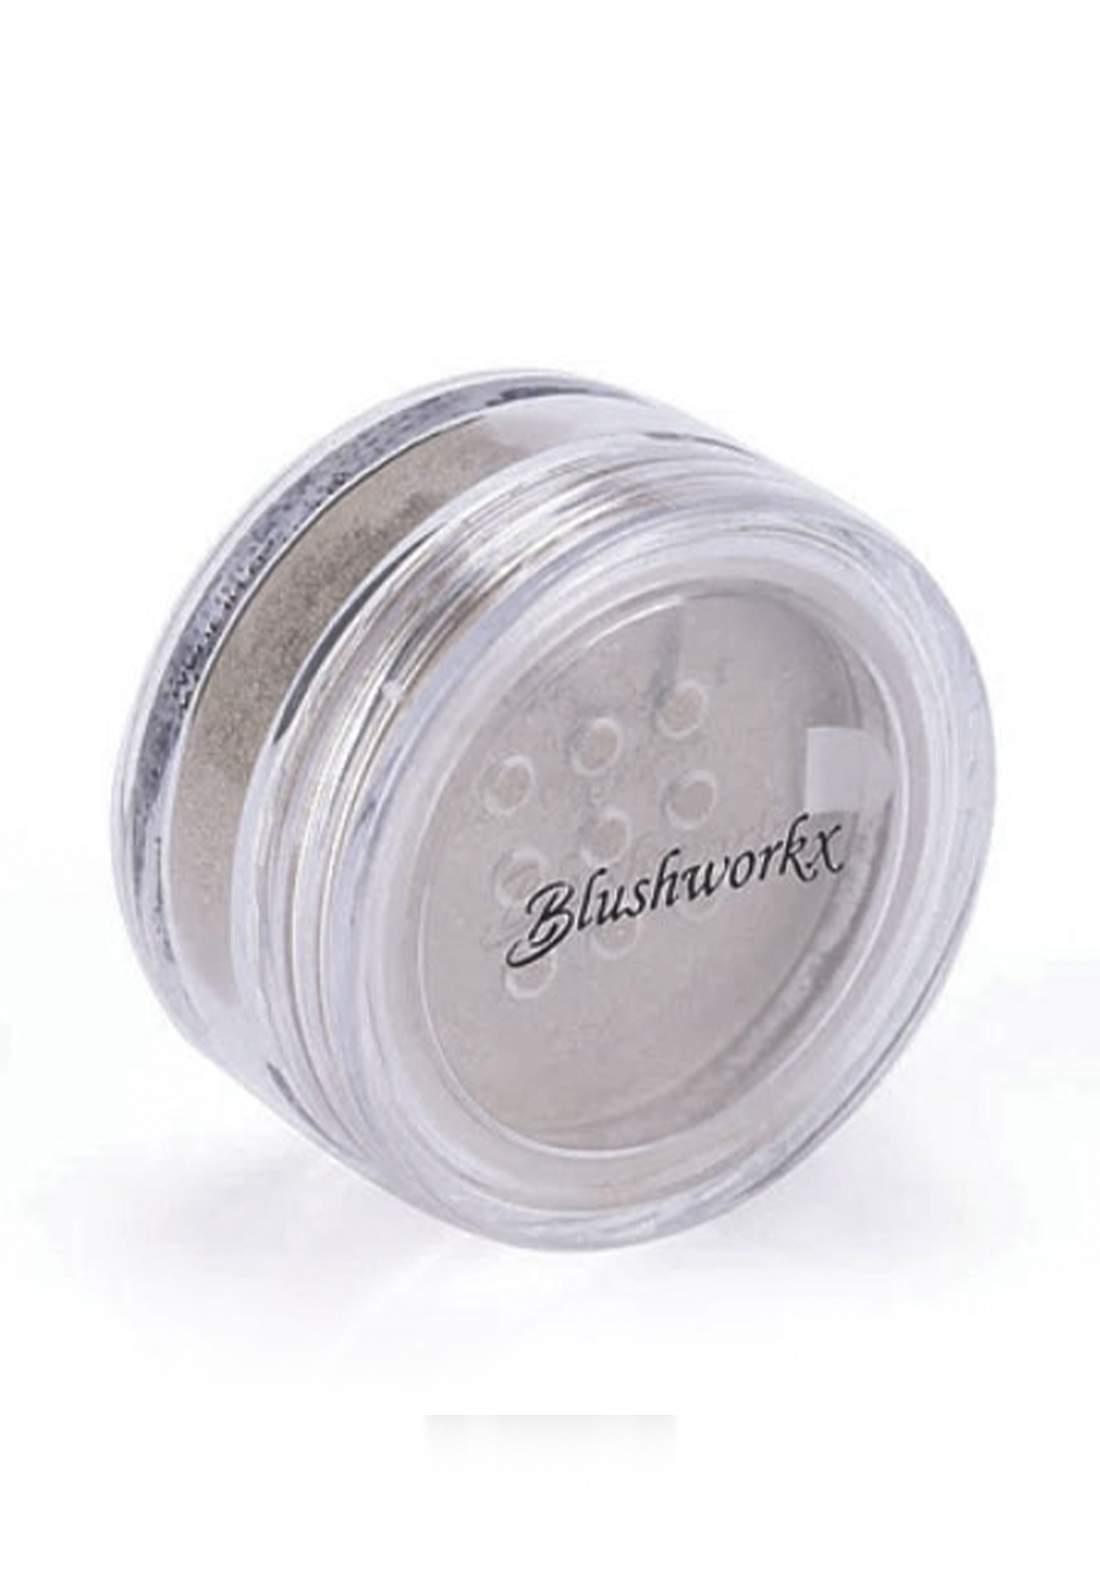 Blushworkx Hollywood Mineral Eye Dust No.21 Opal 1.5g ظلال للعيون